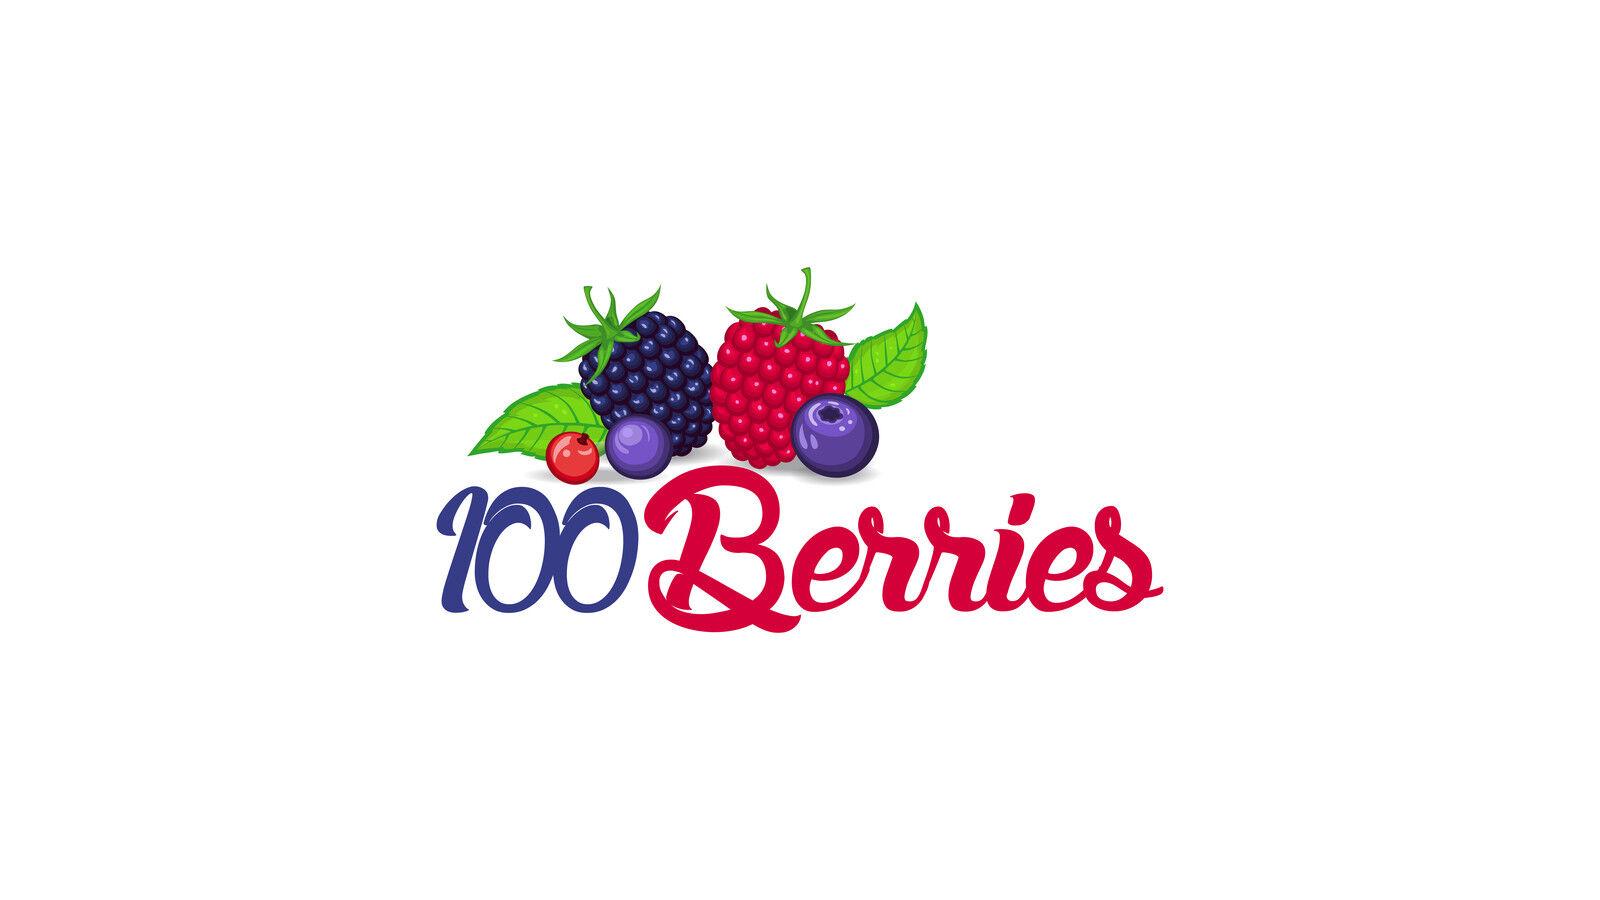 100 Berries